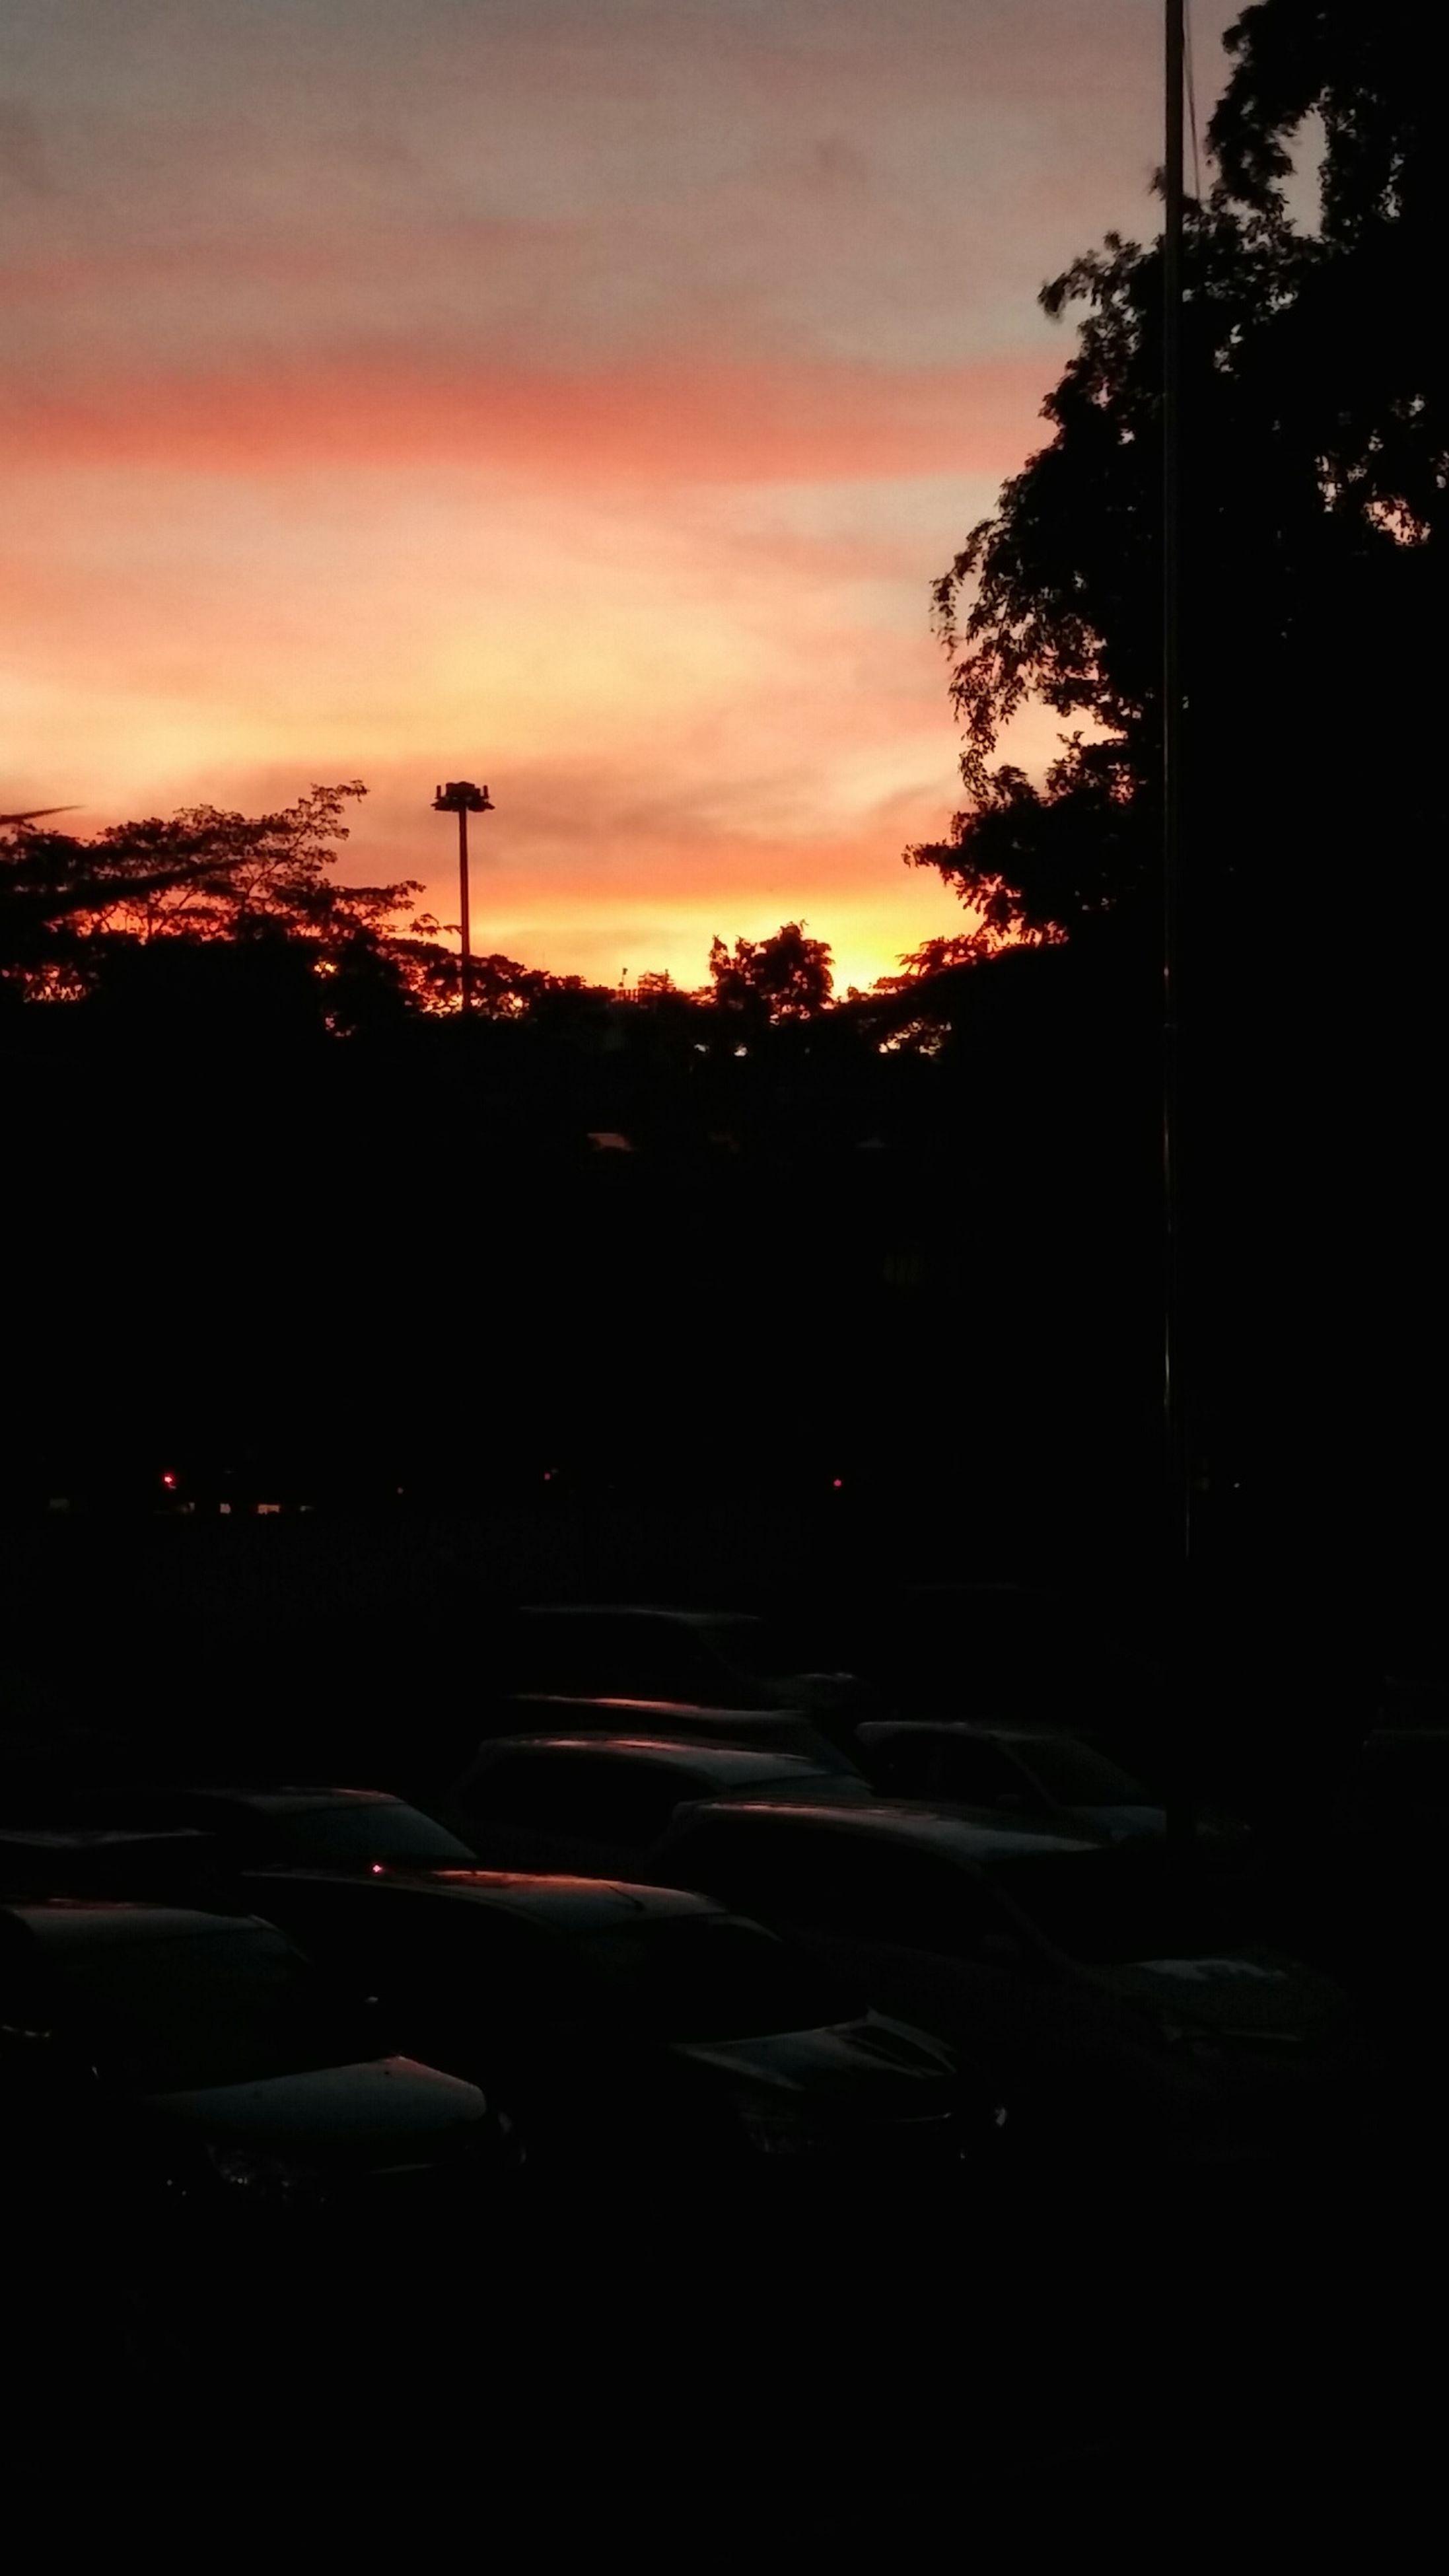 sunset, silhouette, tree, transportation, sky, car, land vehicle, orange color, street light, mode of transport, cloud - sky, road, street, dusk, nature, scenics, tranquility, cloud, beauty in nature, dark